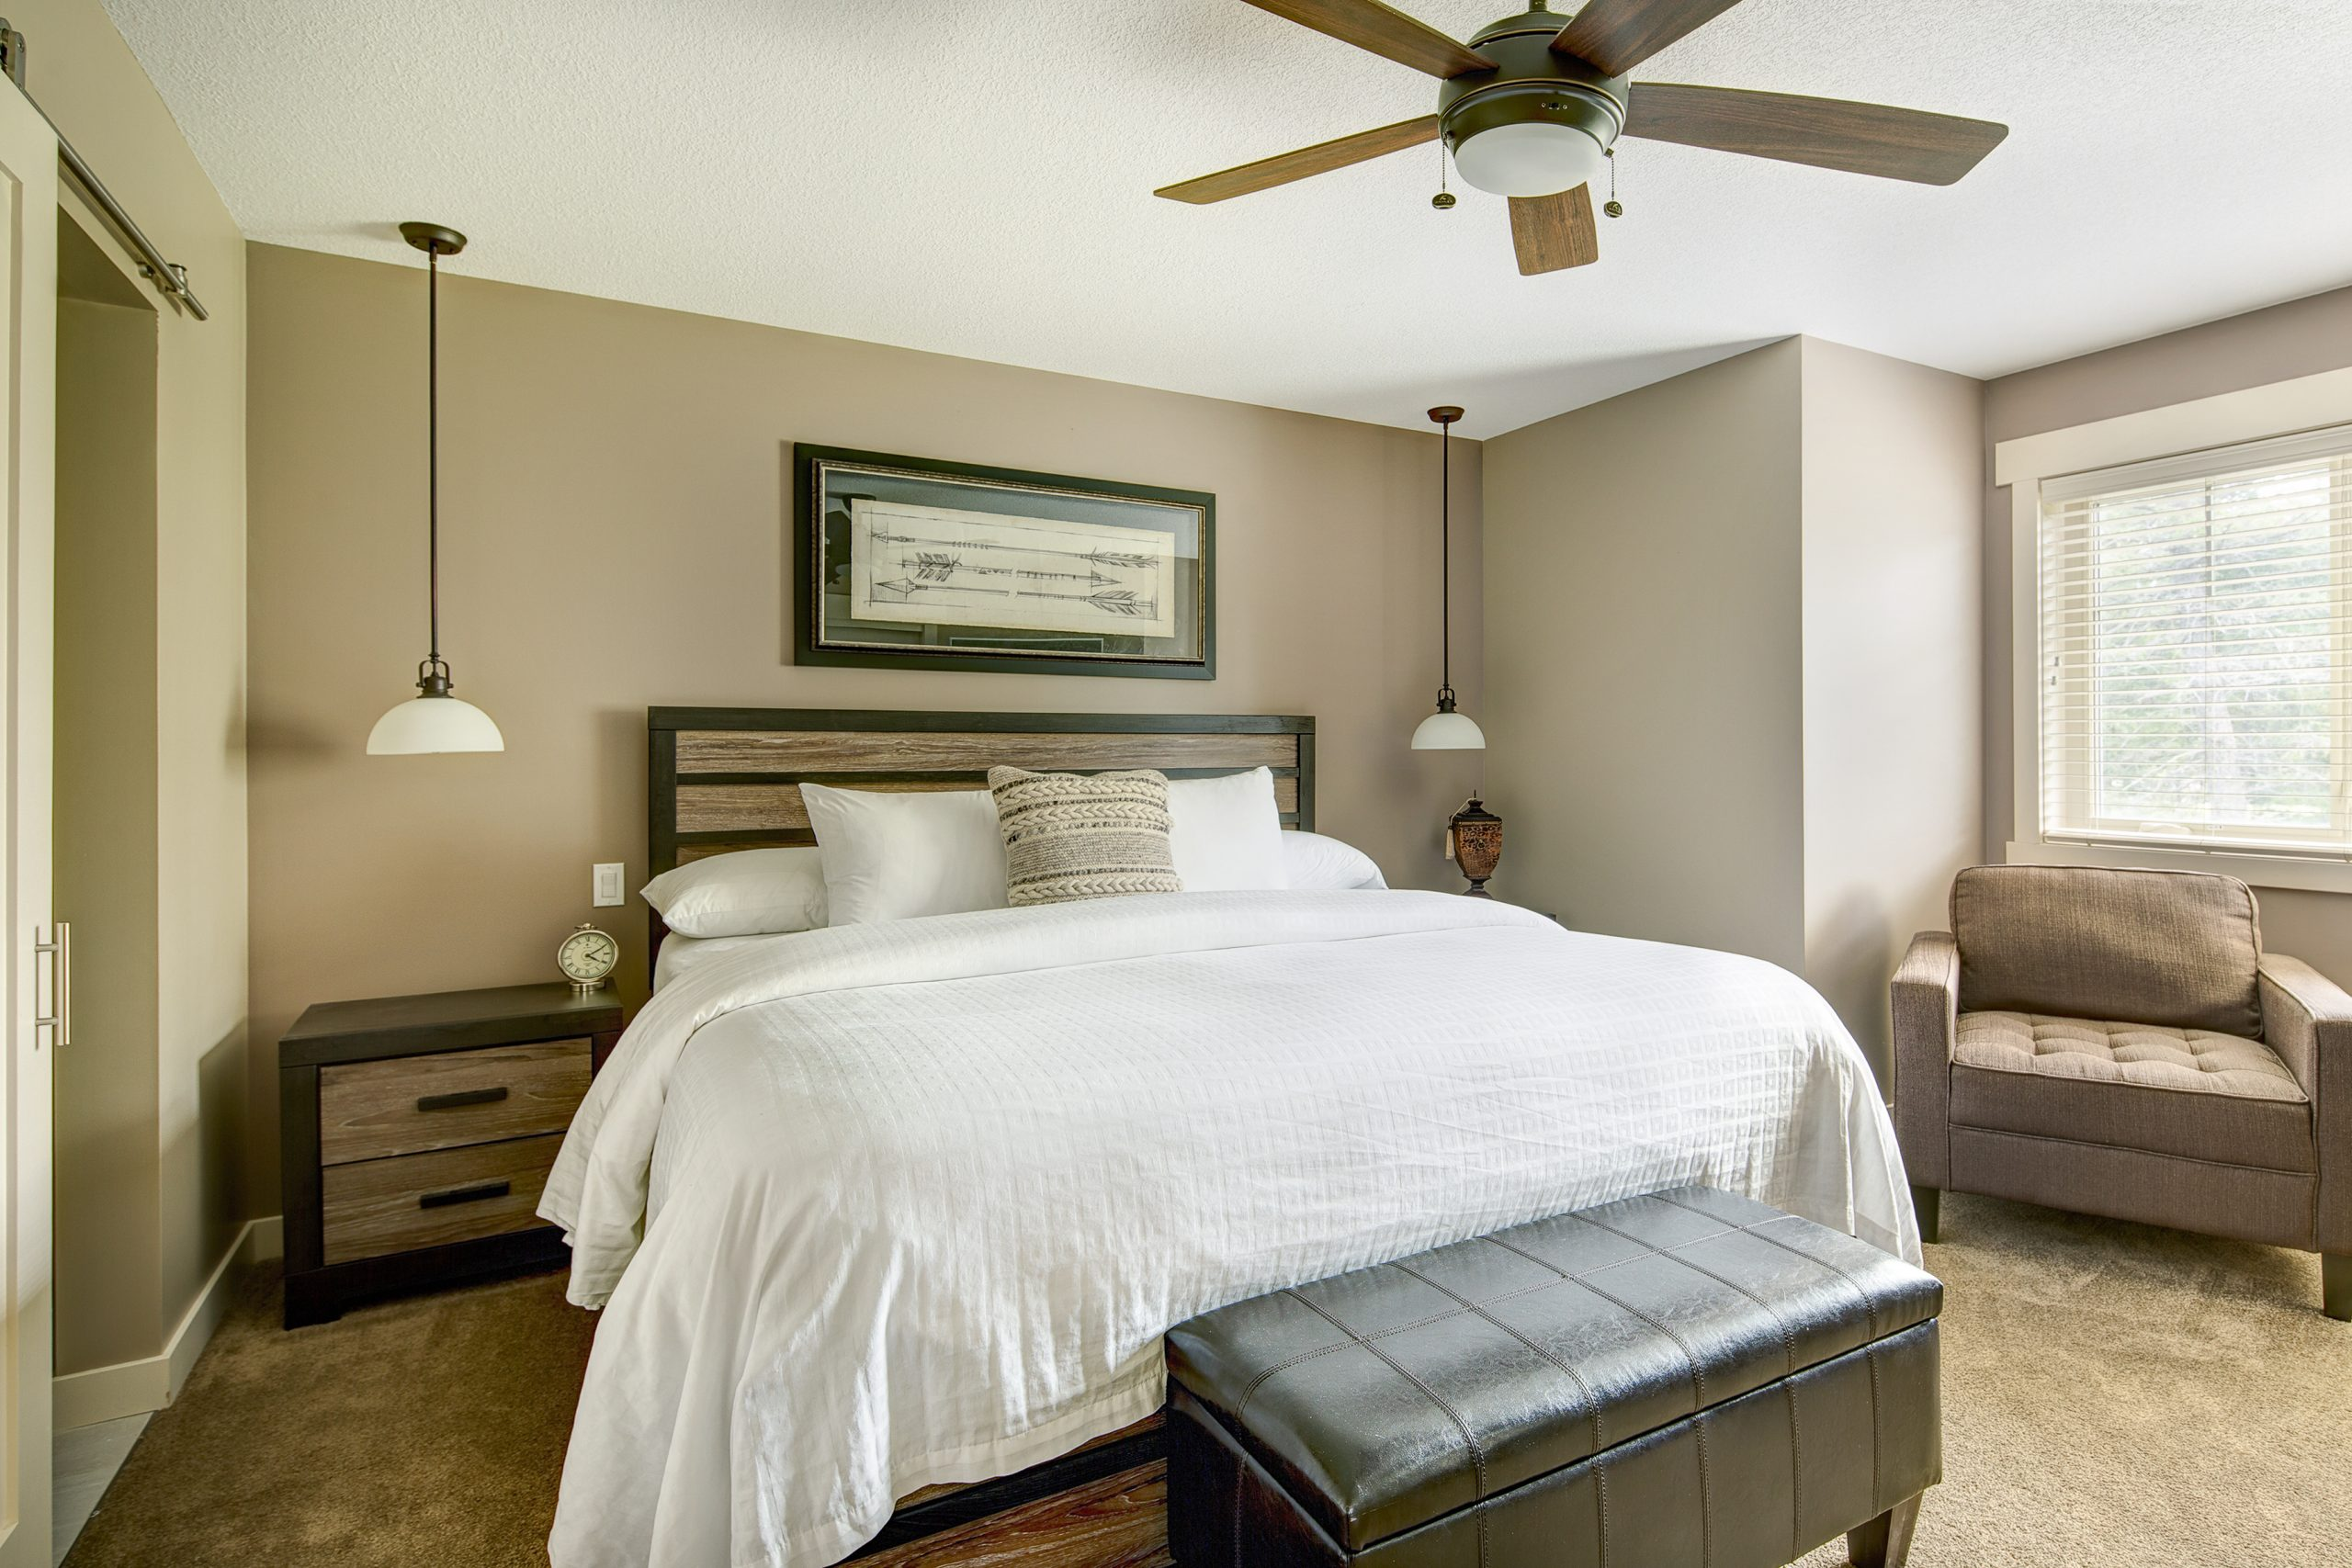 2-Bedroom Townhomes